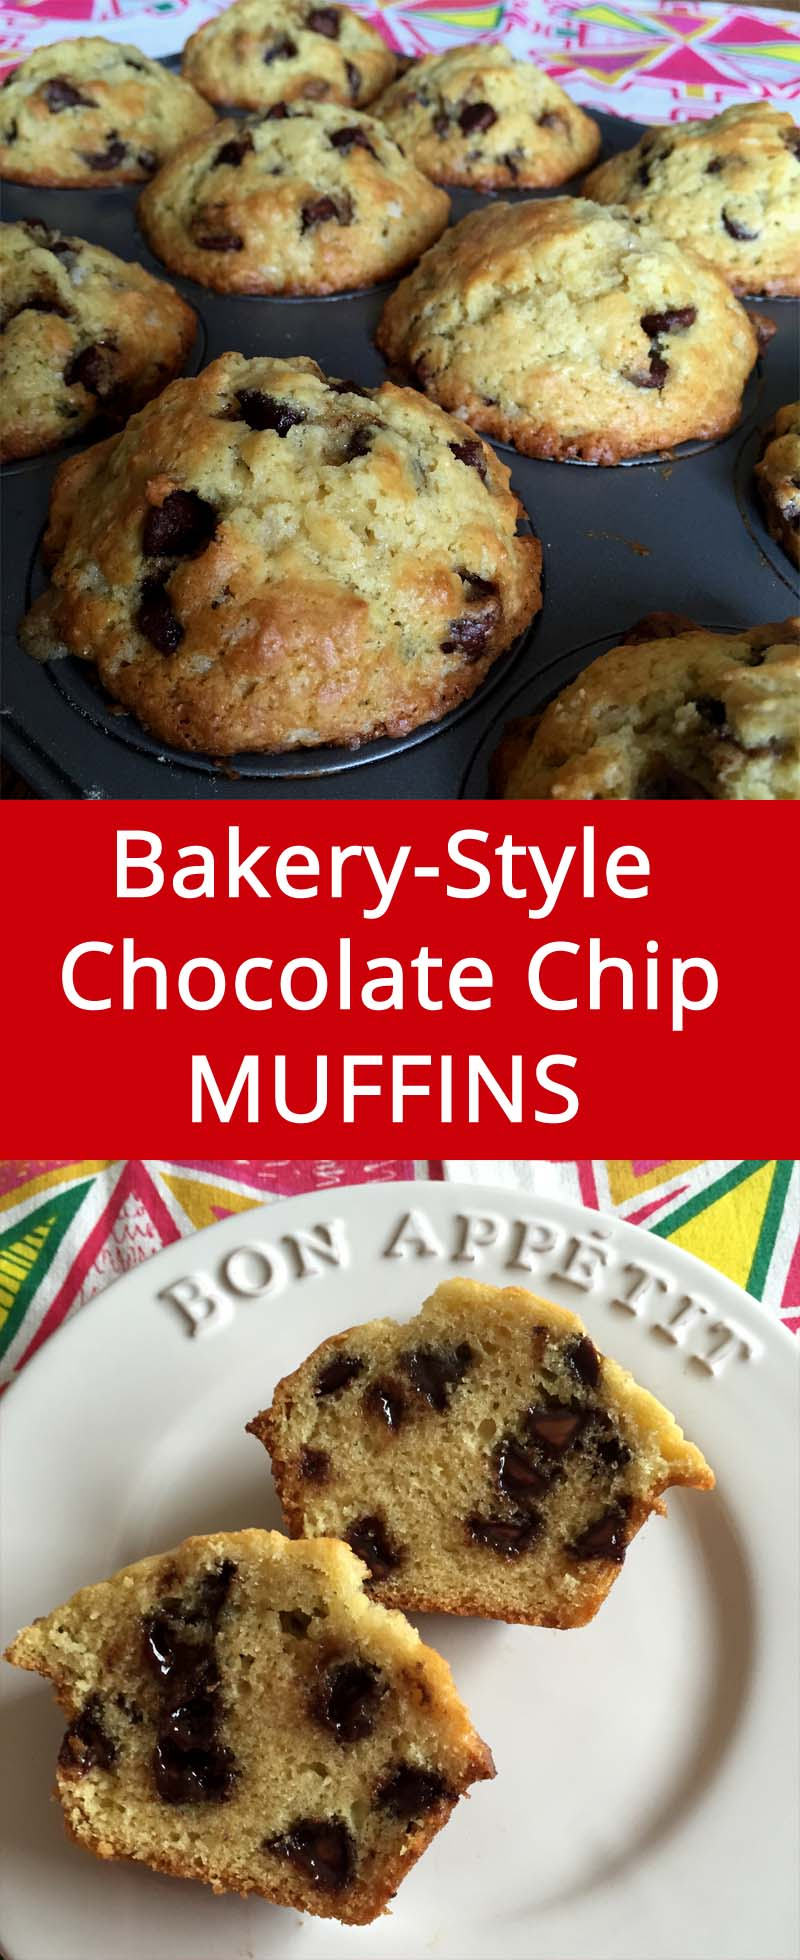 Bakery-Style Homemade Chocolate Chip Muffins Recipe | MelanieCooks.com